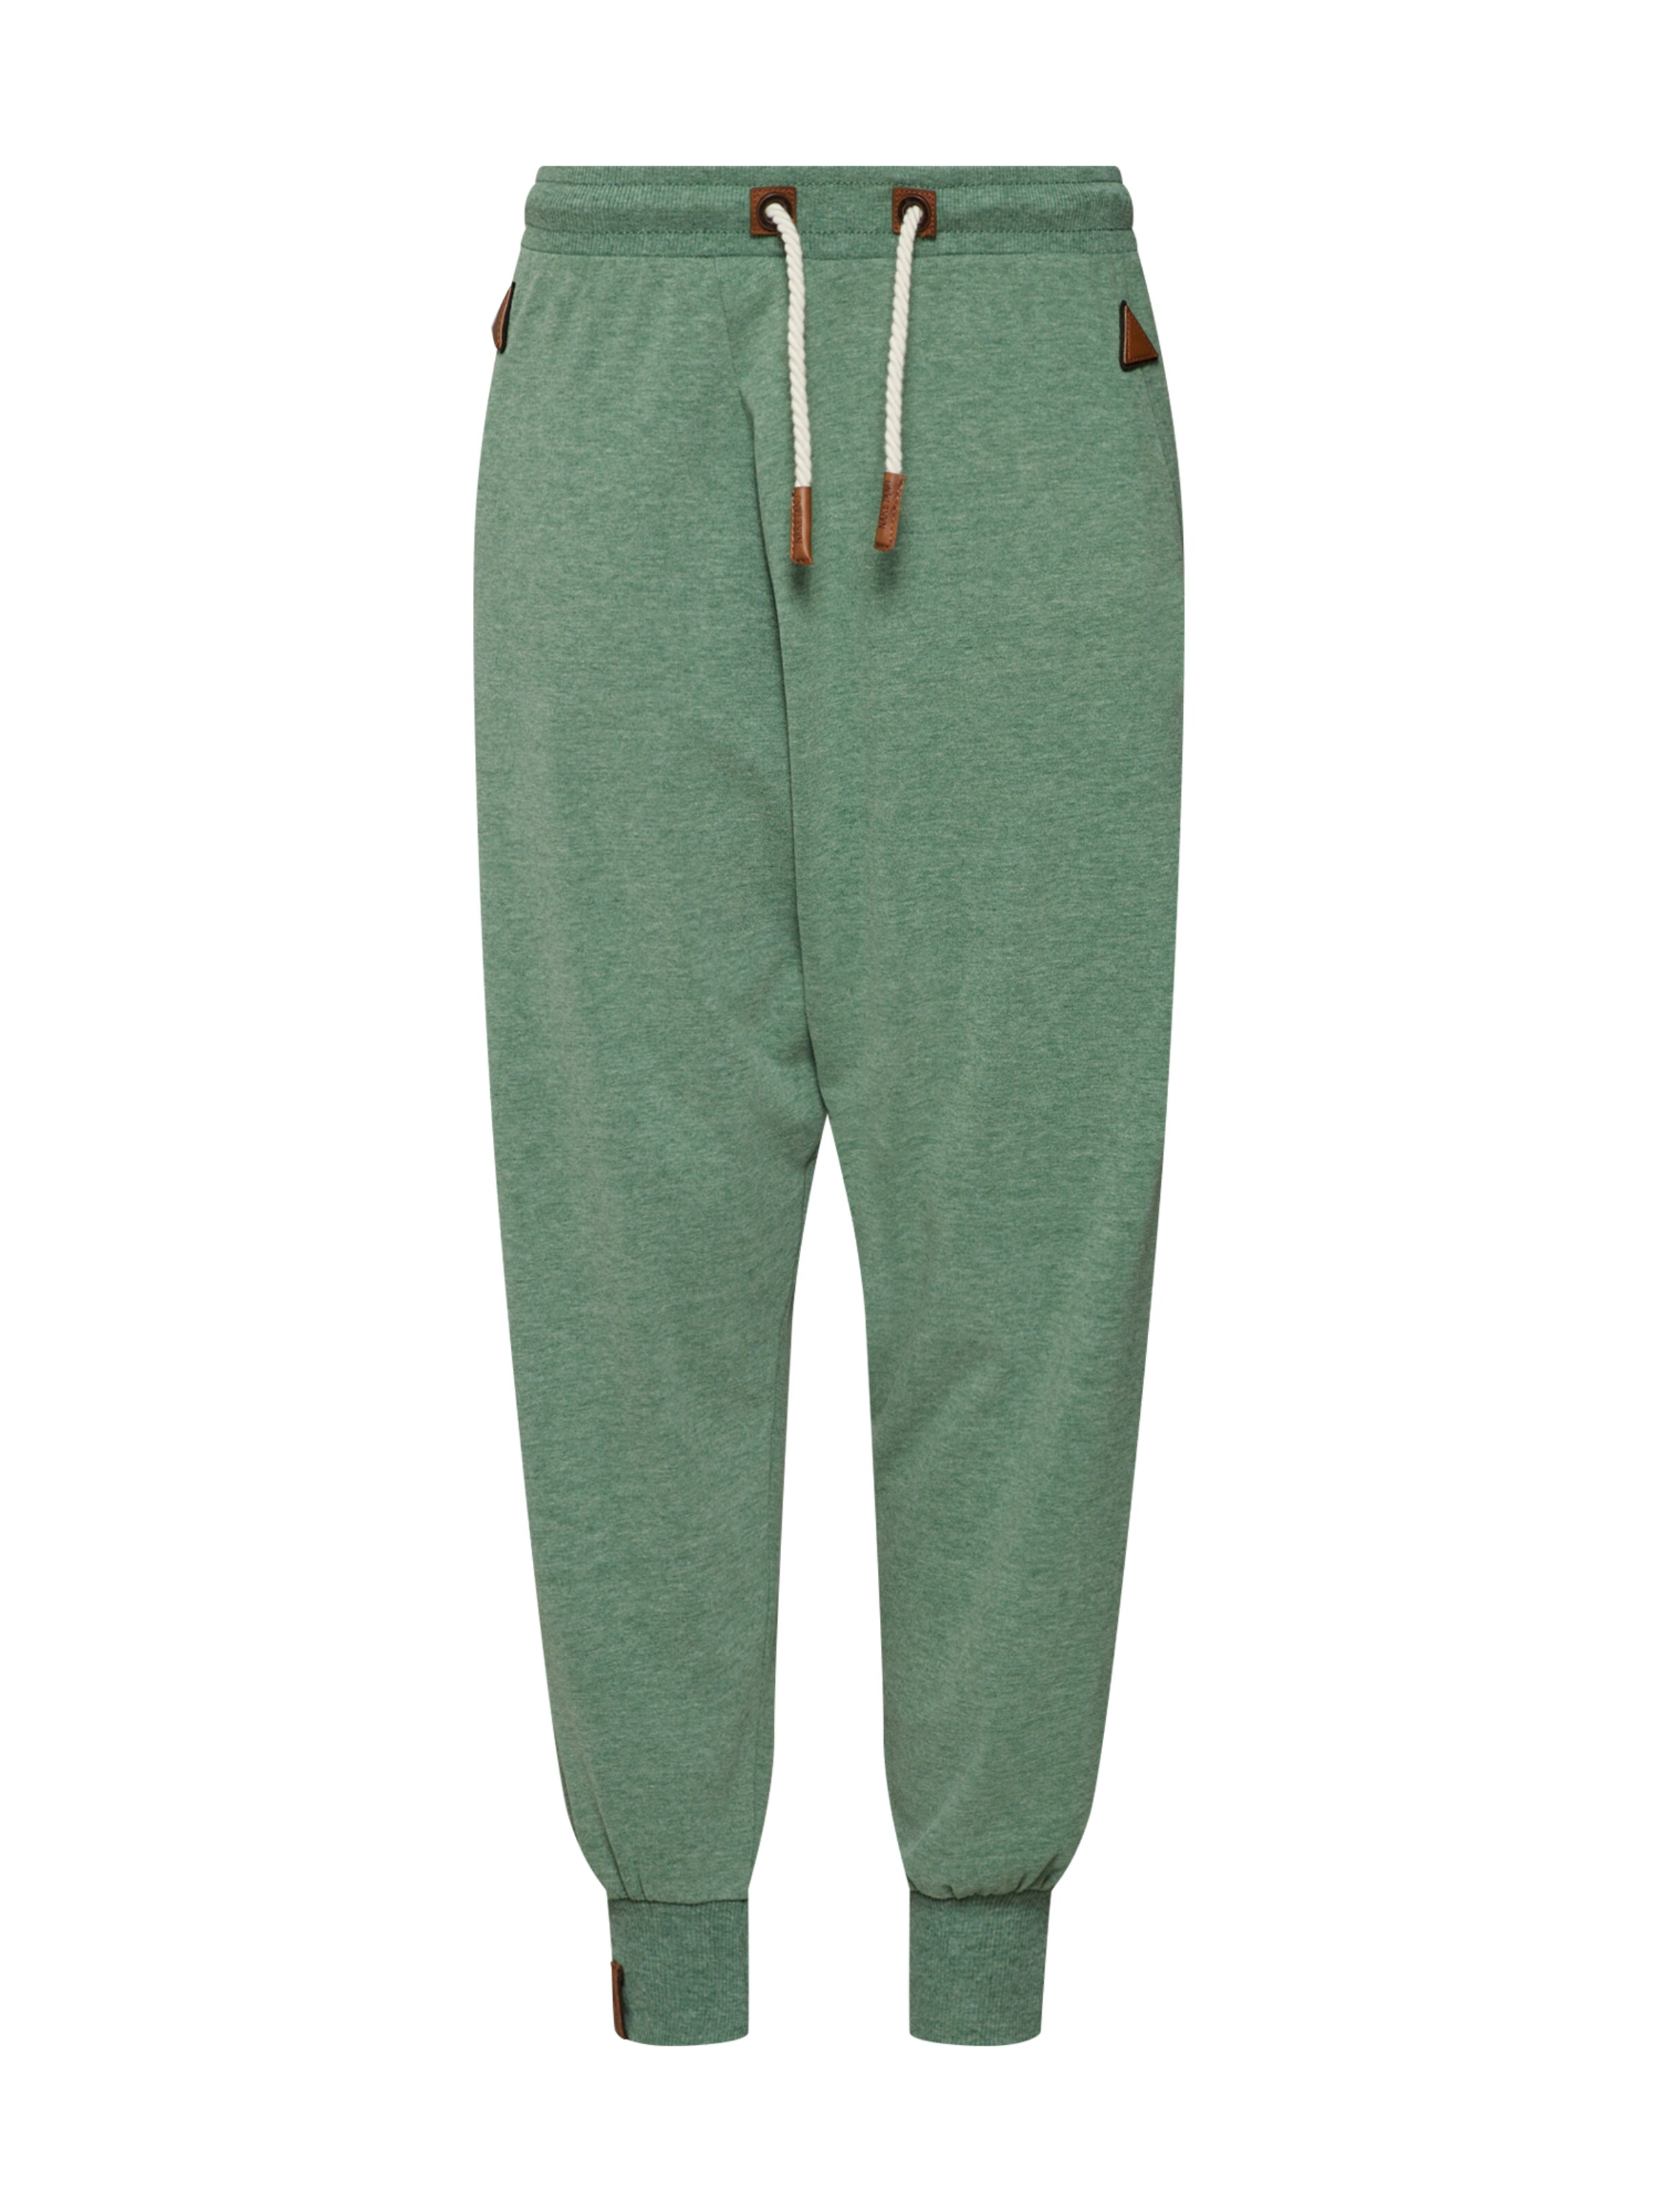 Pantalon Vert Gazon Naketano En 'eiapopaia' n0OPNZk8wX